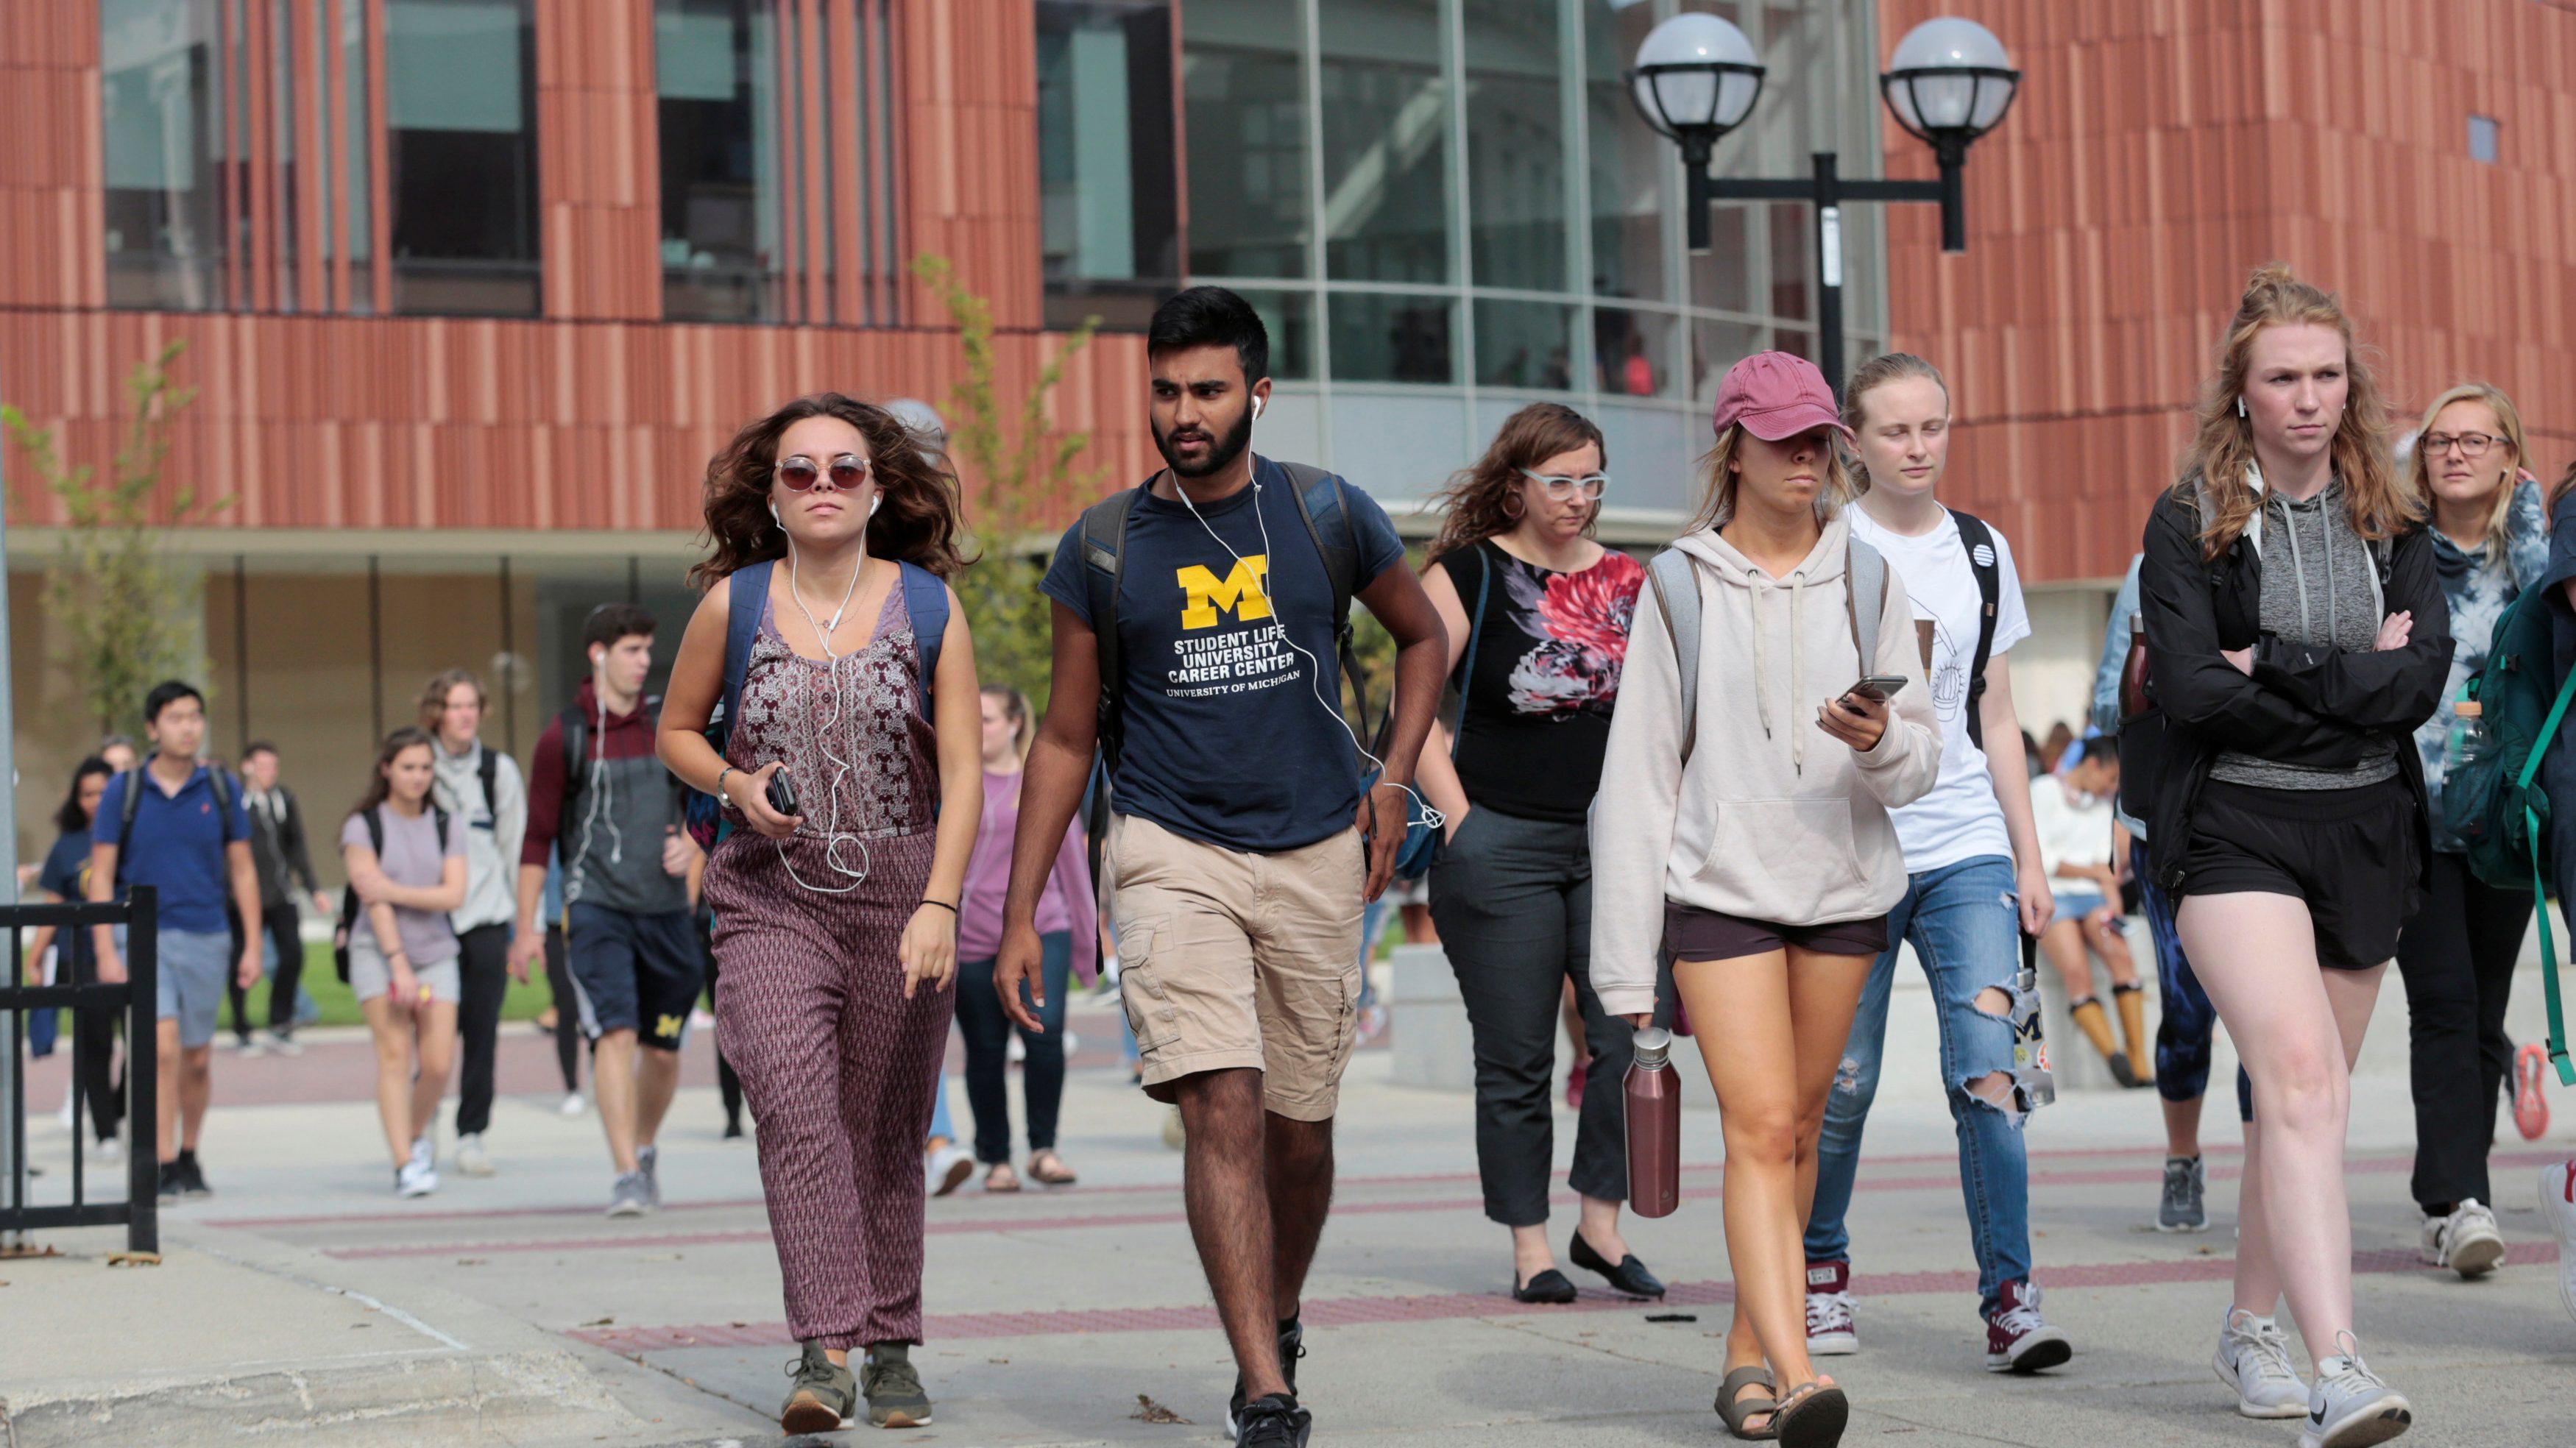 University of Michigan students walk on campus in Ann Arbor